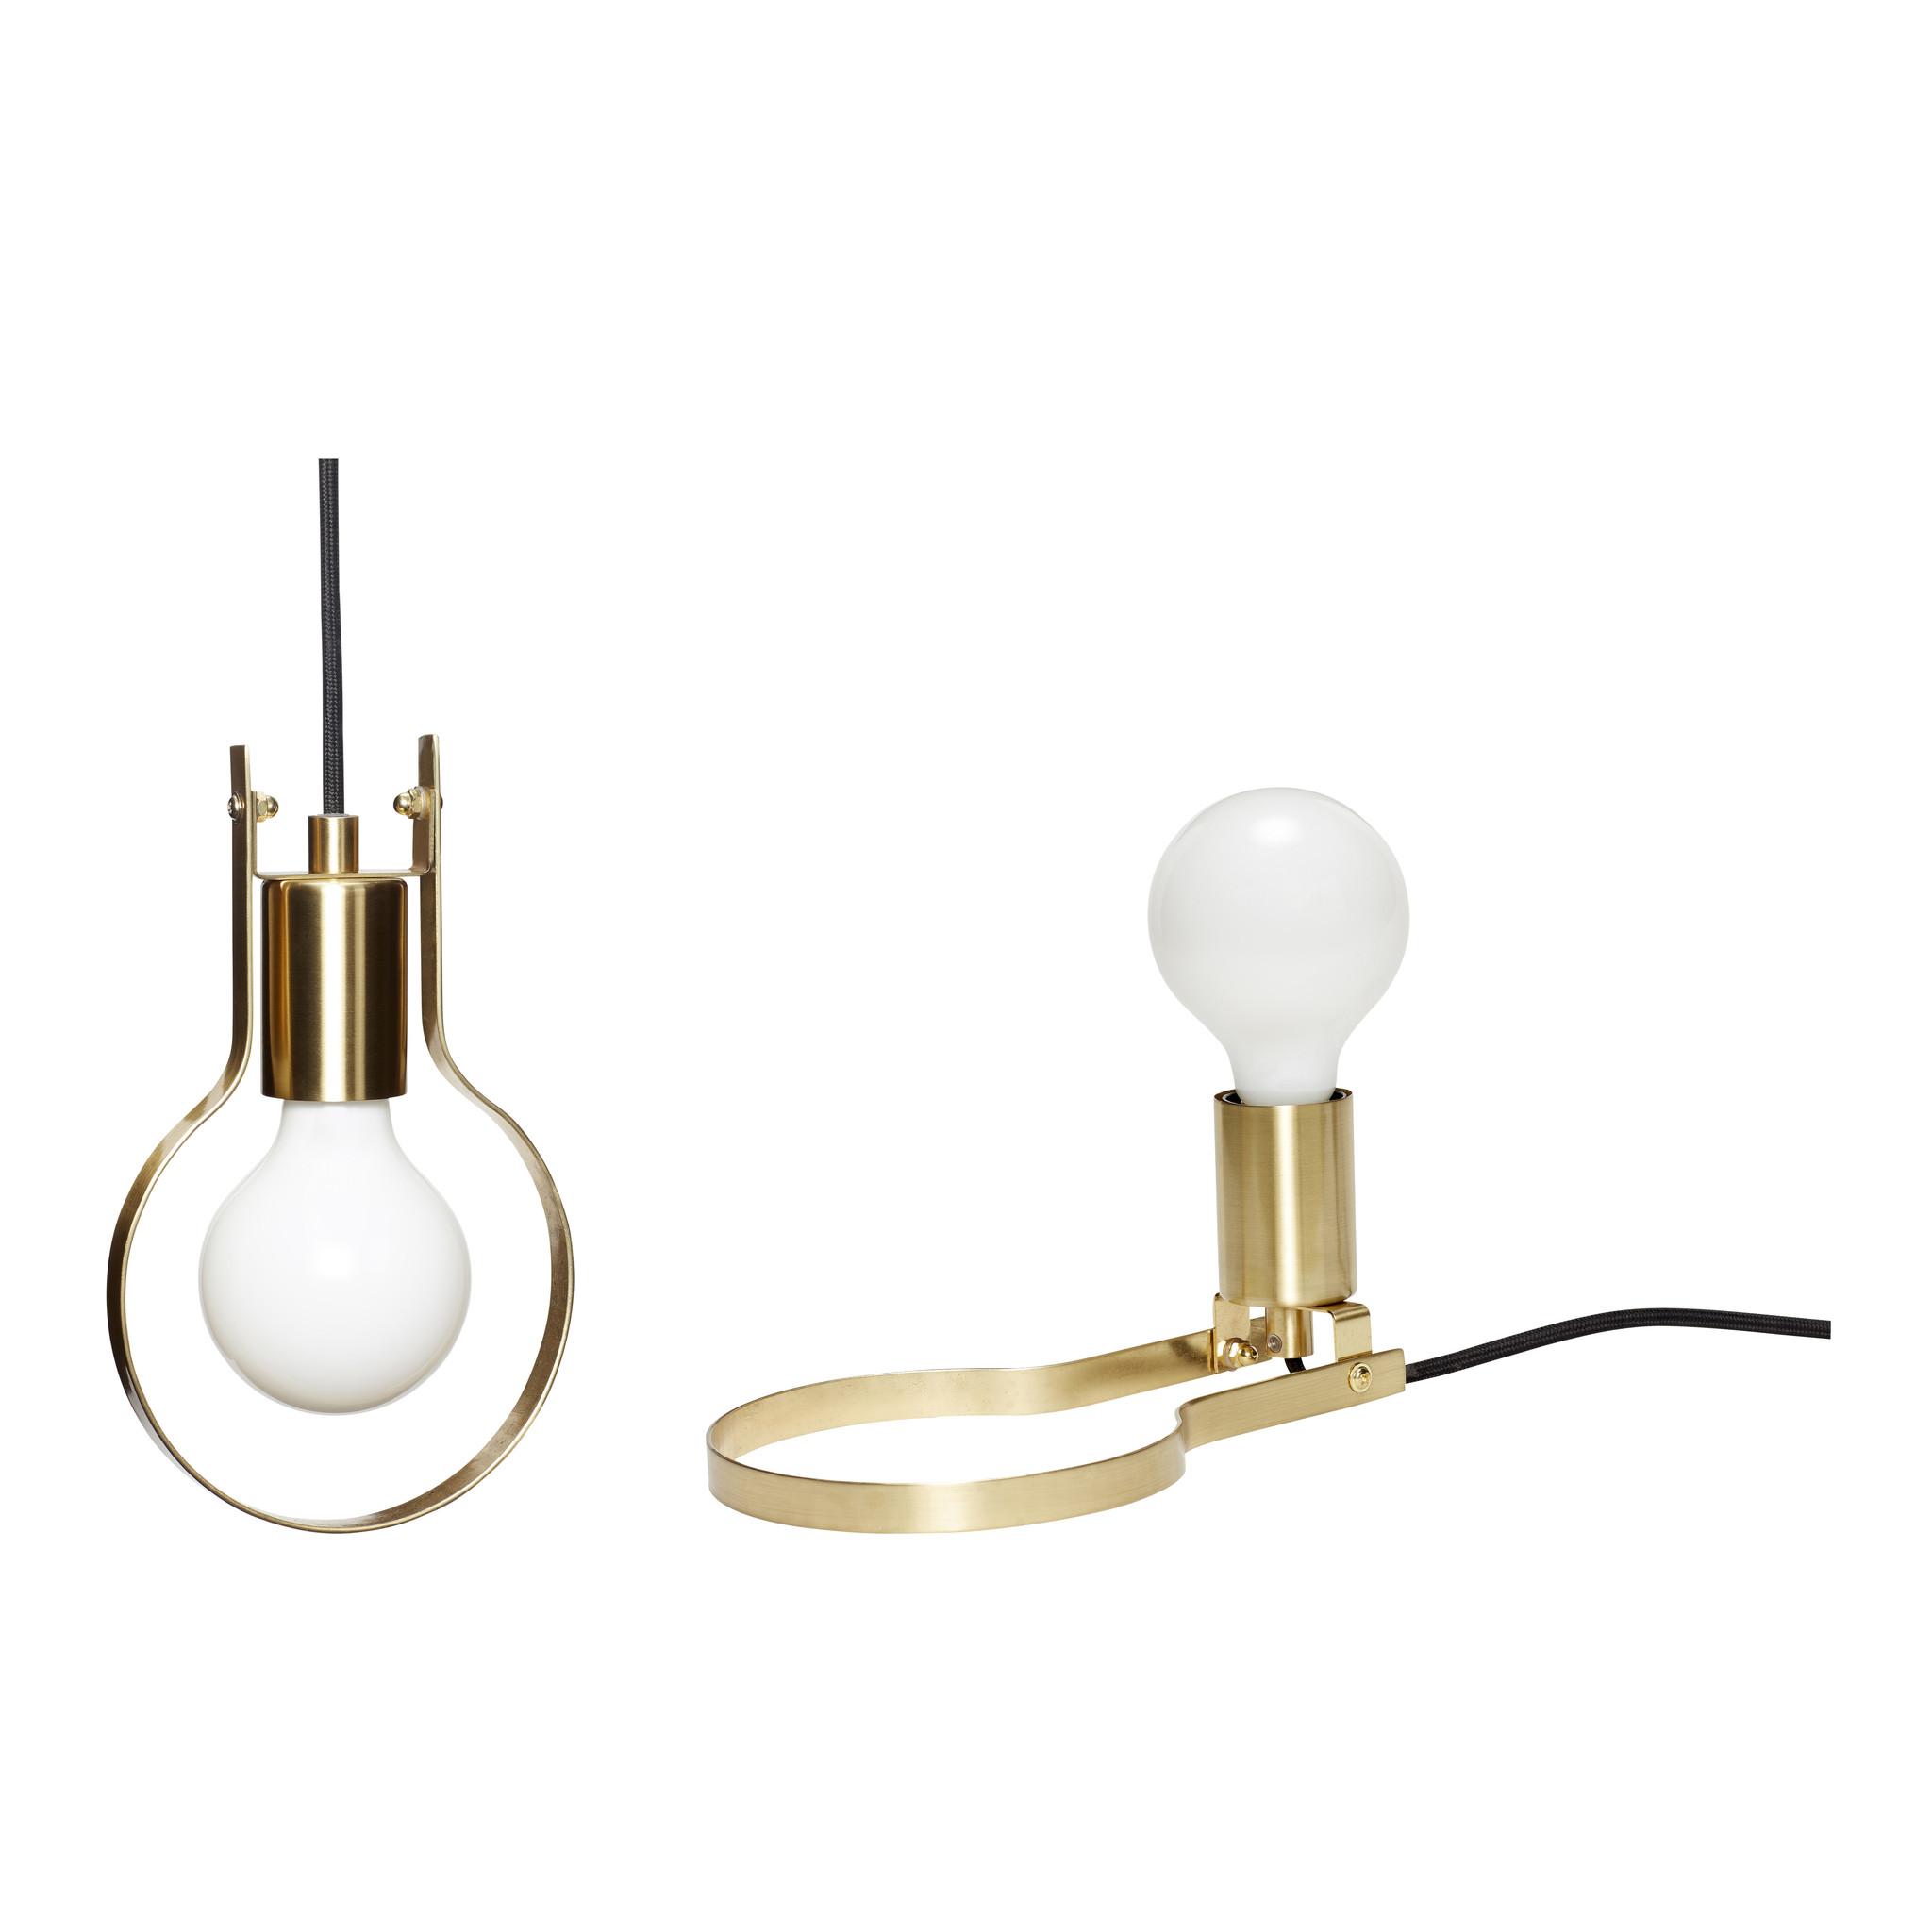 Hubsch Lamp / tafellamp, metaal, messing